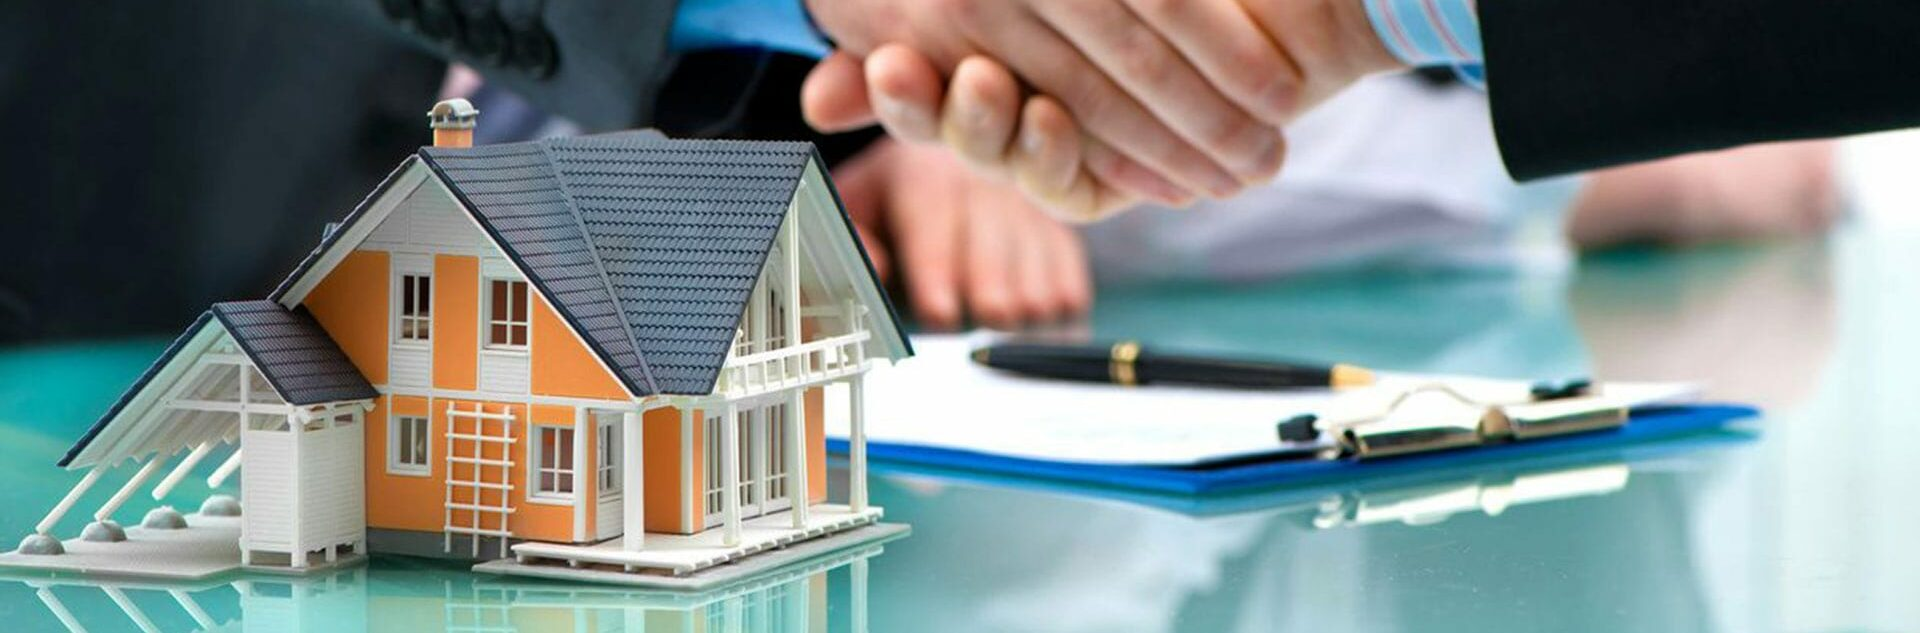 Utah Home Builders Association